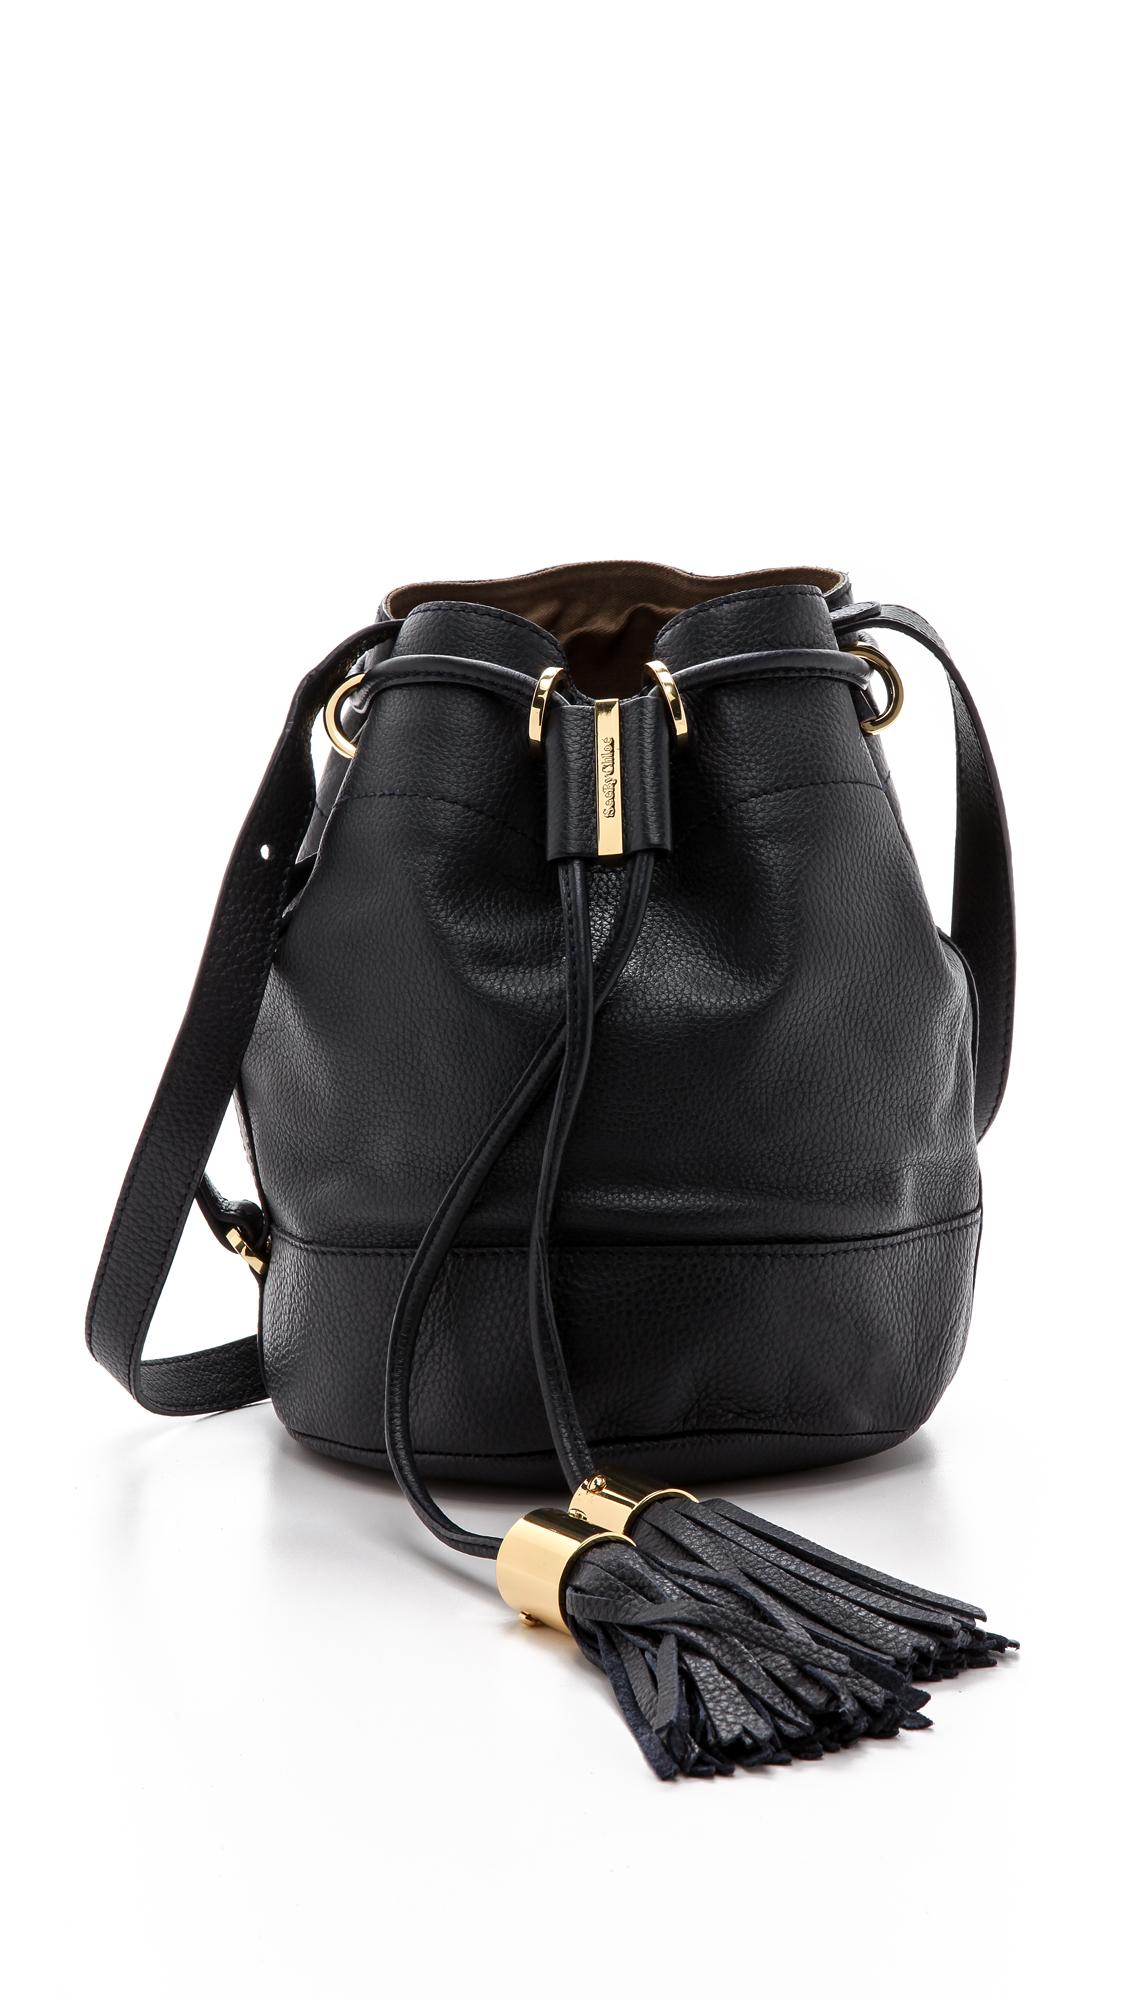 see by chloe bags shop online chloe knockoff bags. Black Bedroom Furniture Sets. Home Design Ideas